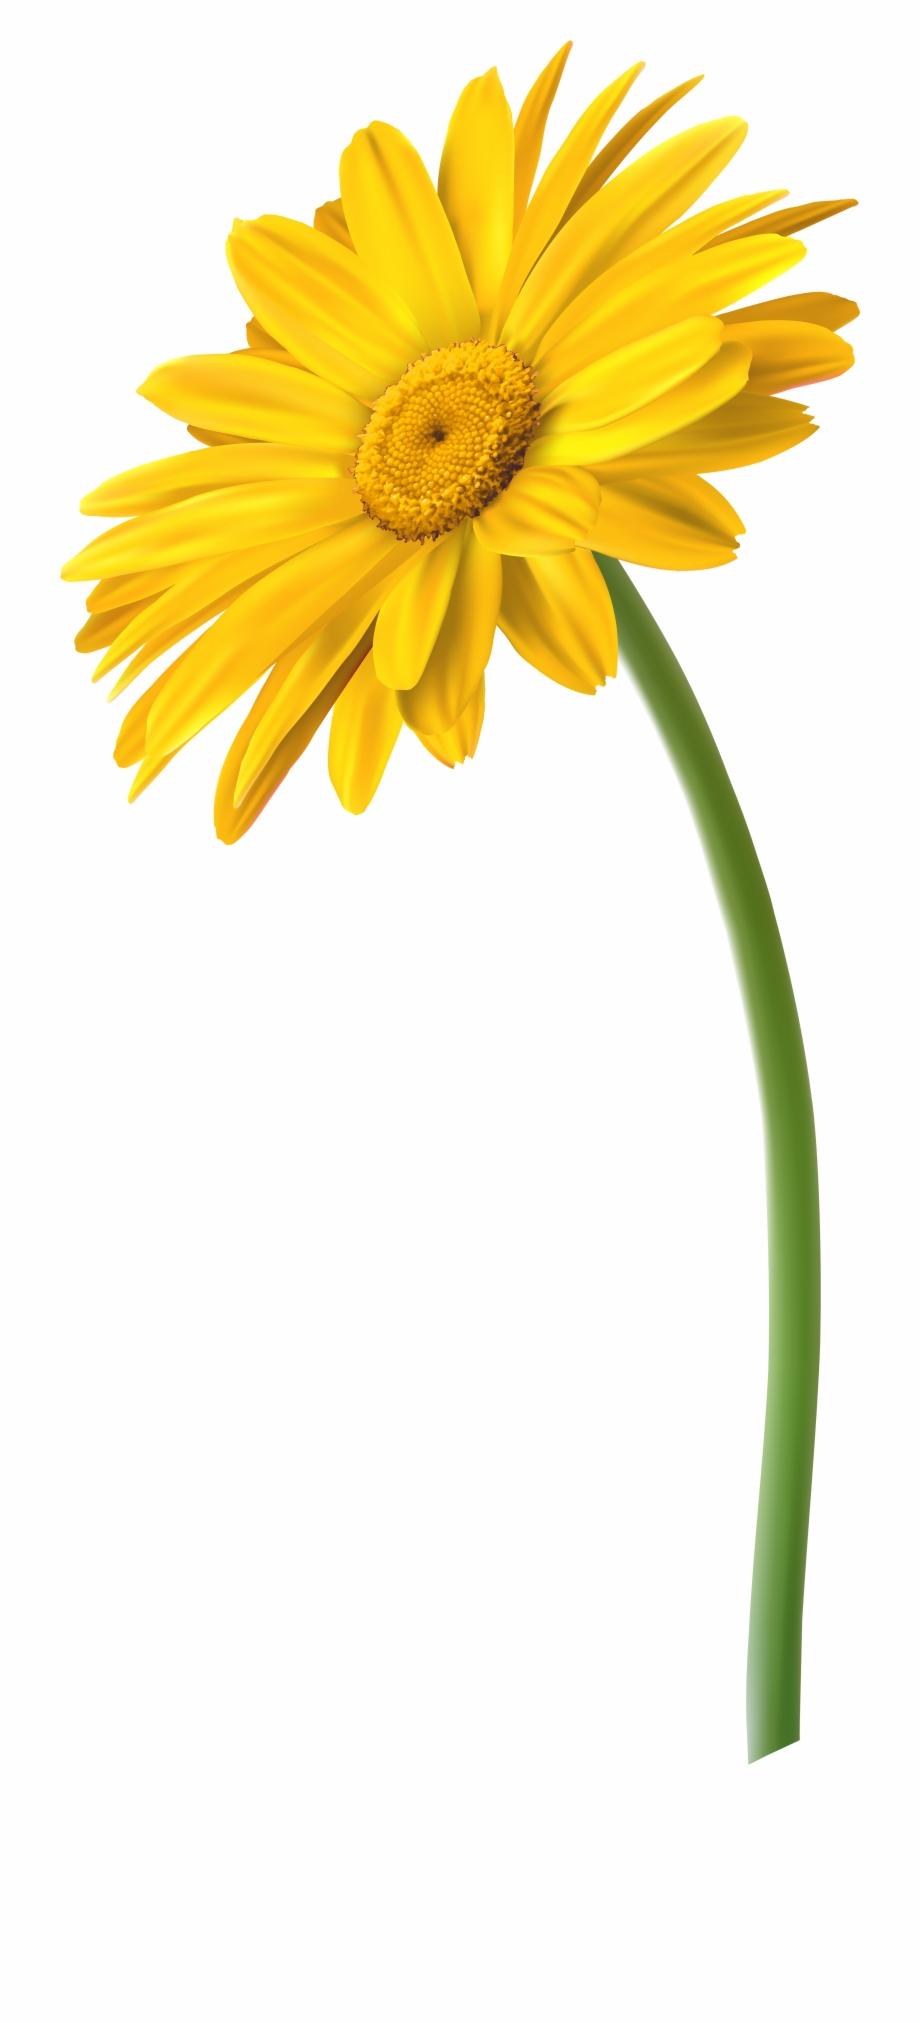 Daisies Clipart Light Yellow Flower - Marguerite Daisy ...